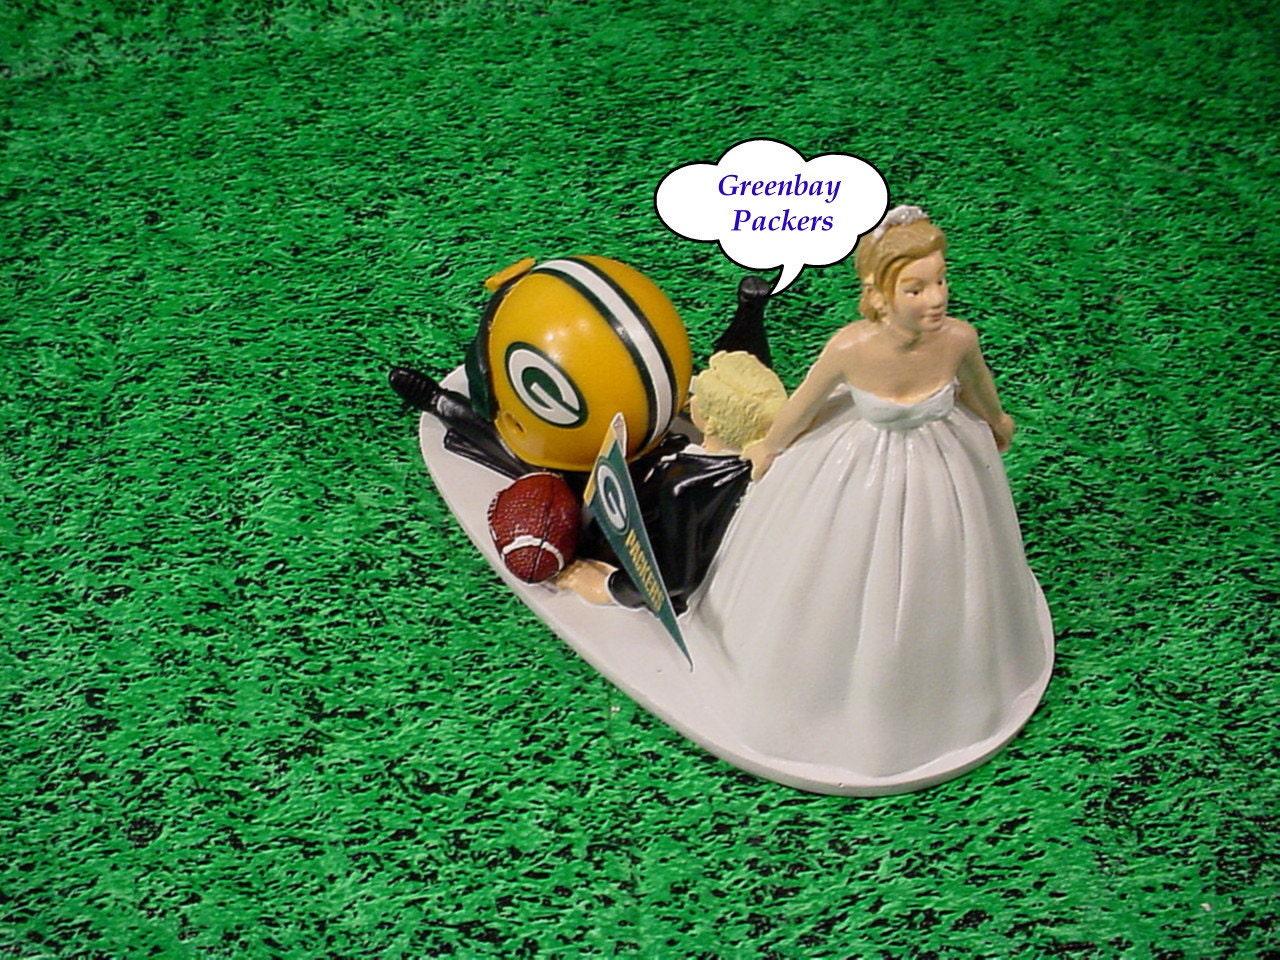 Green bay packers football fan sports bride dragging blonde for Green bay packers wedding dress